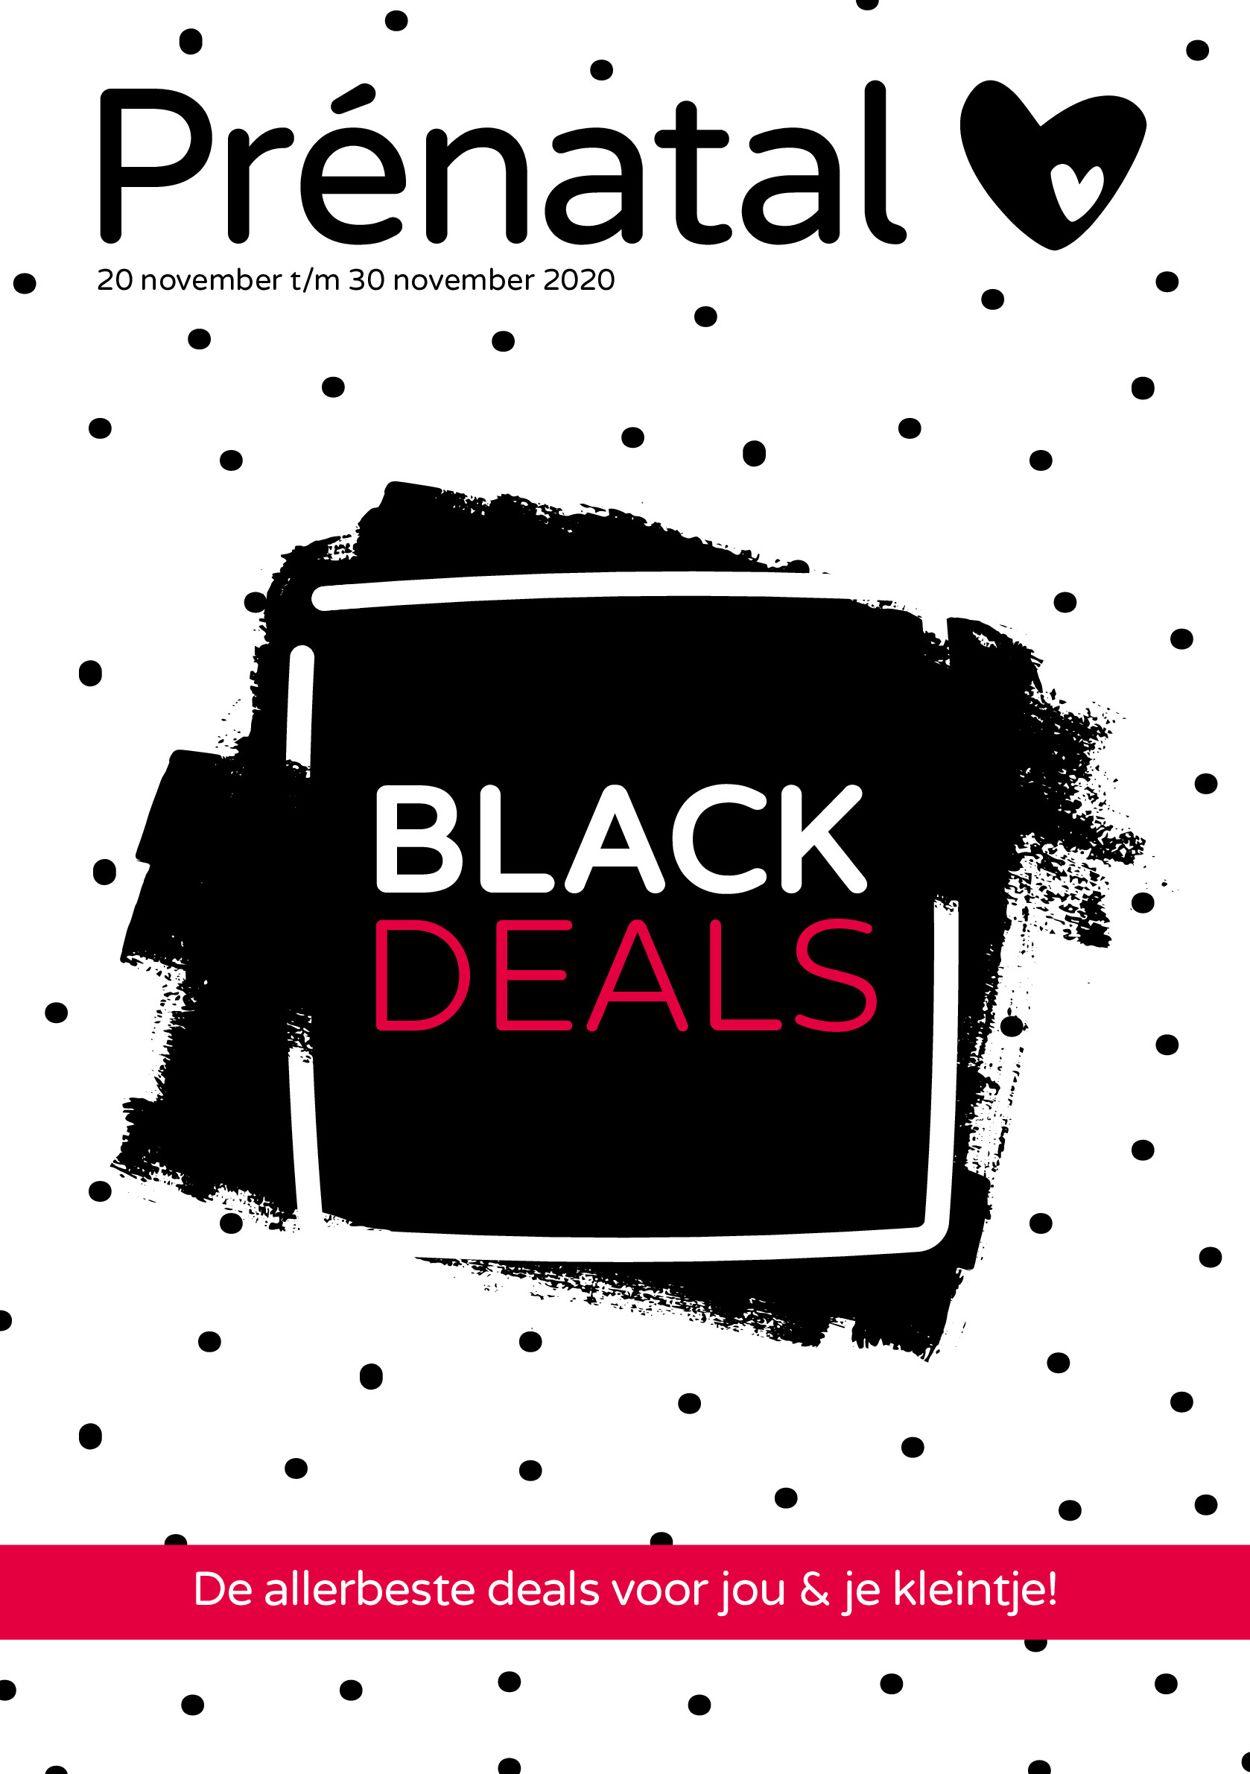 Catalogus van Prénatal - Black Friday 2020 van 20.11.2020